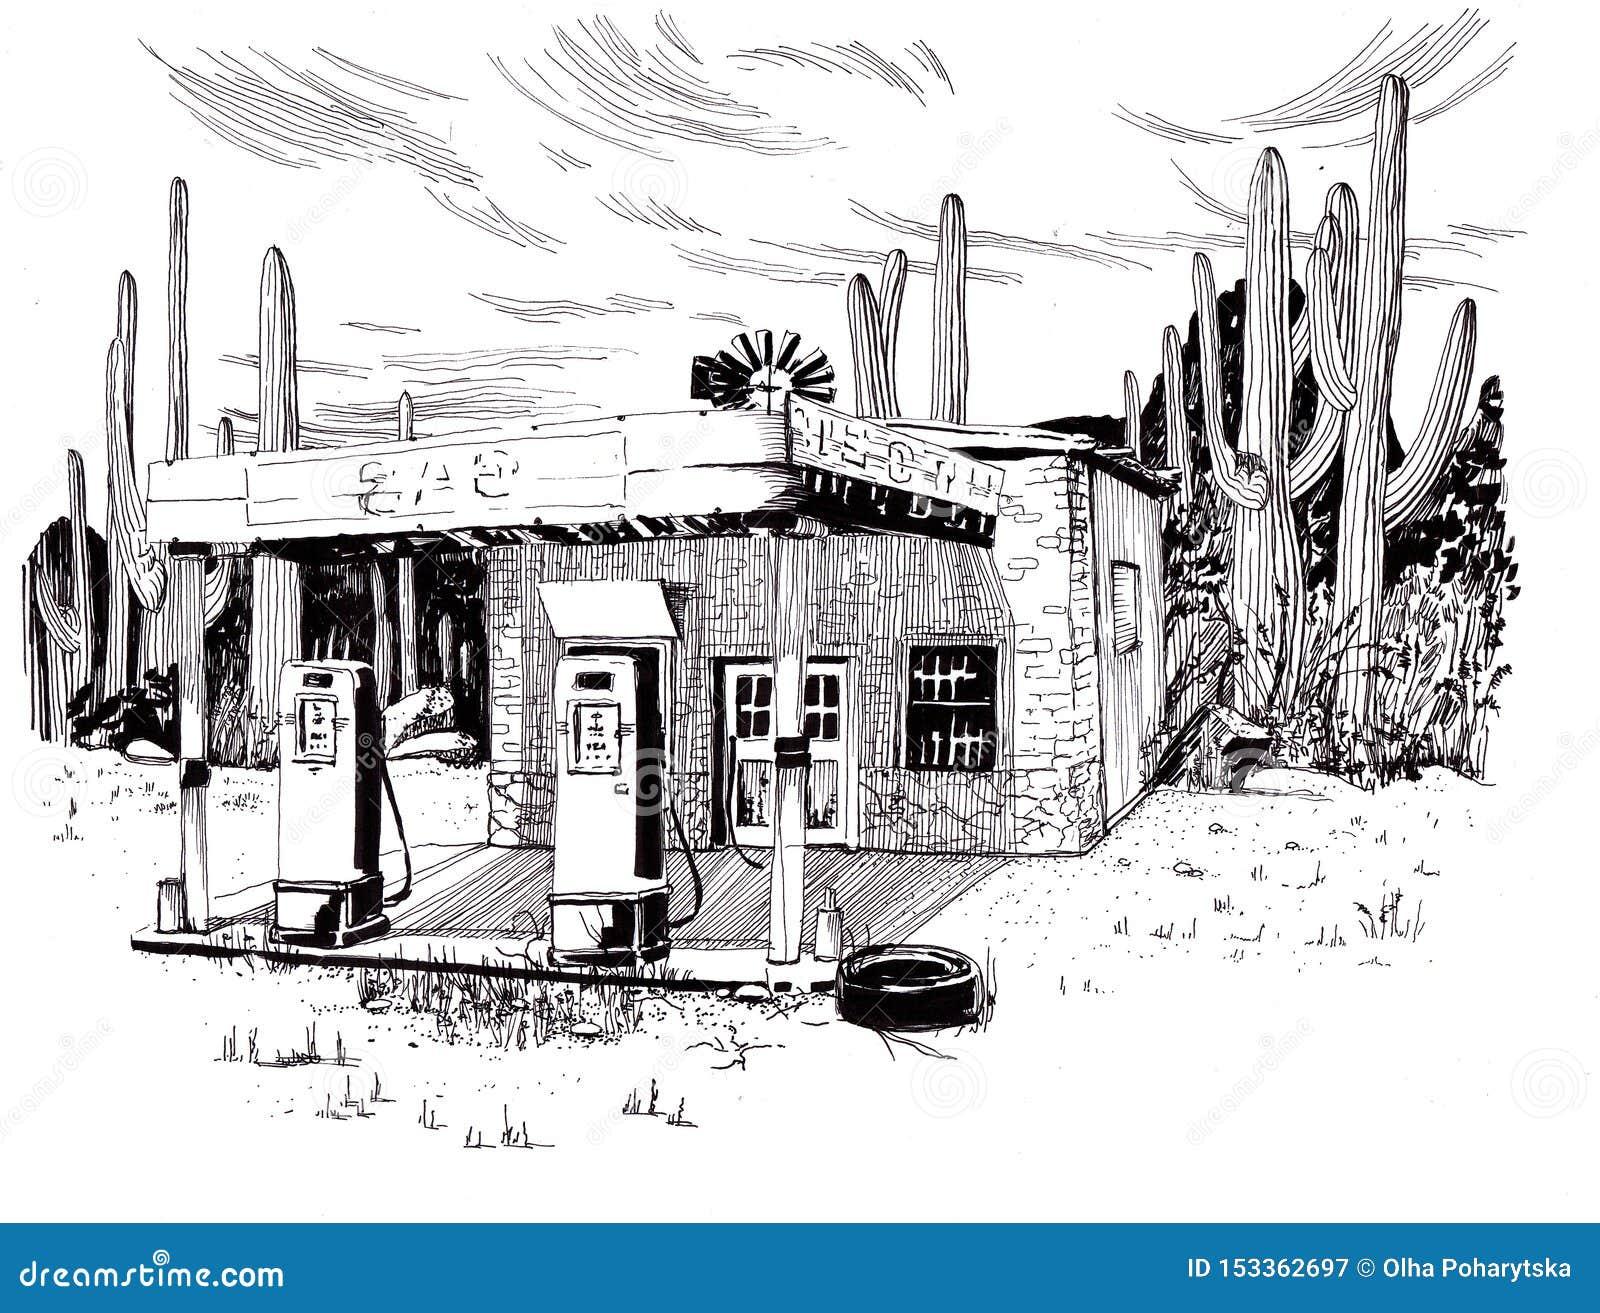 Abandoned Gas Station Sketch Stock Illustration Illustration Of Arizona Gasoline 153362697